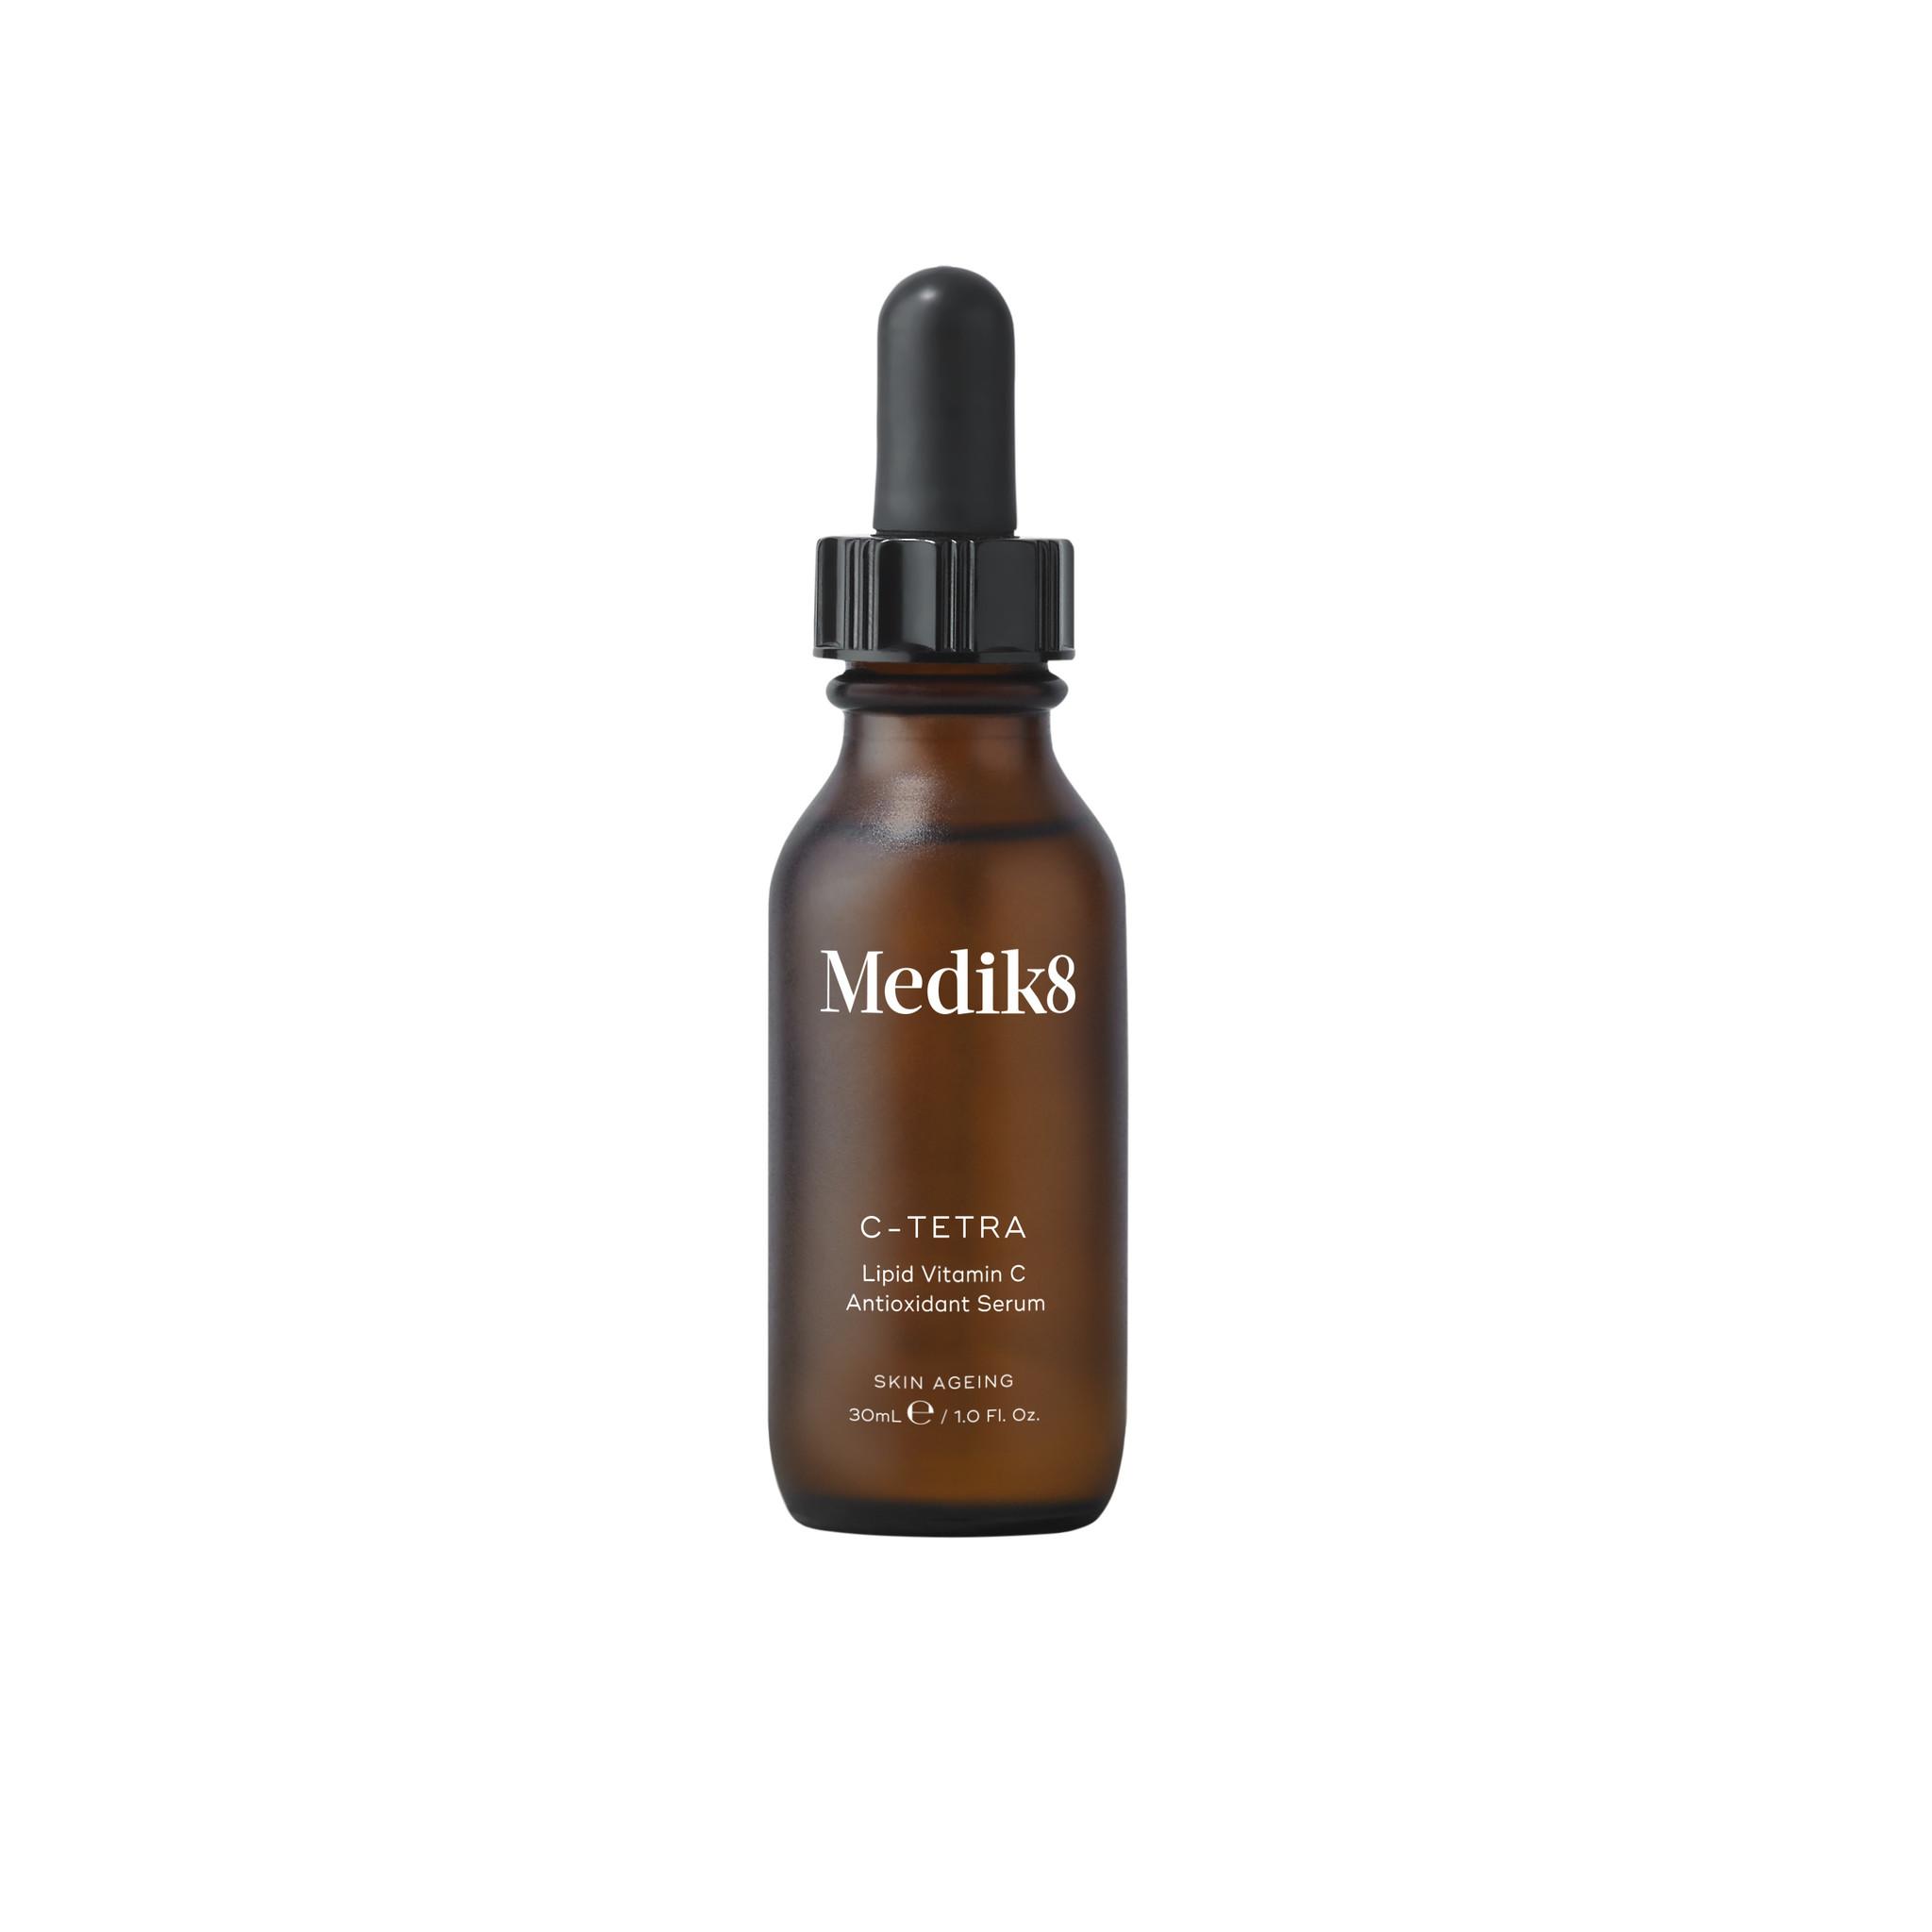 Medik8 Medik8 C-Tetra Serum 30ml